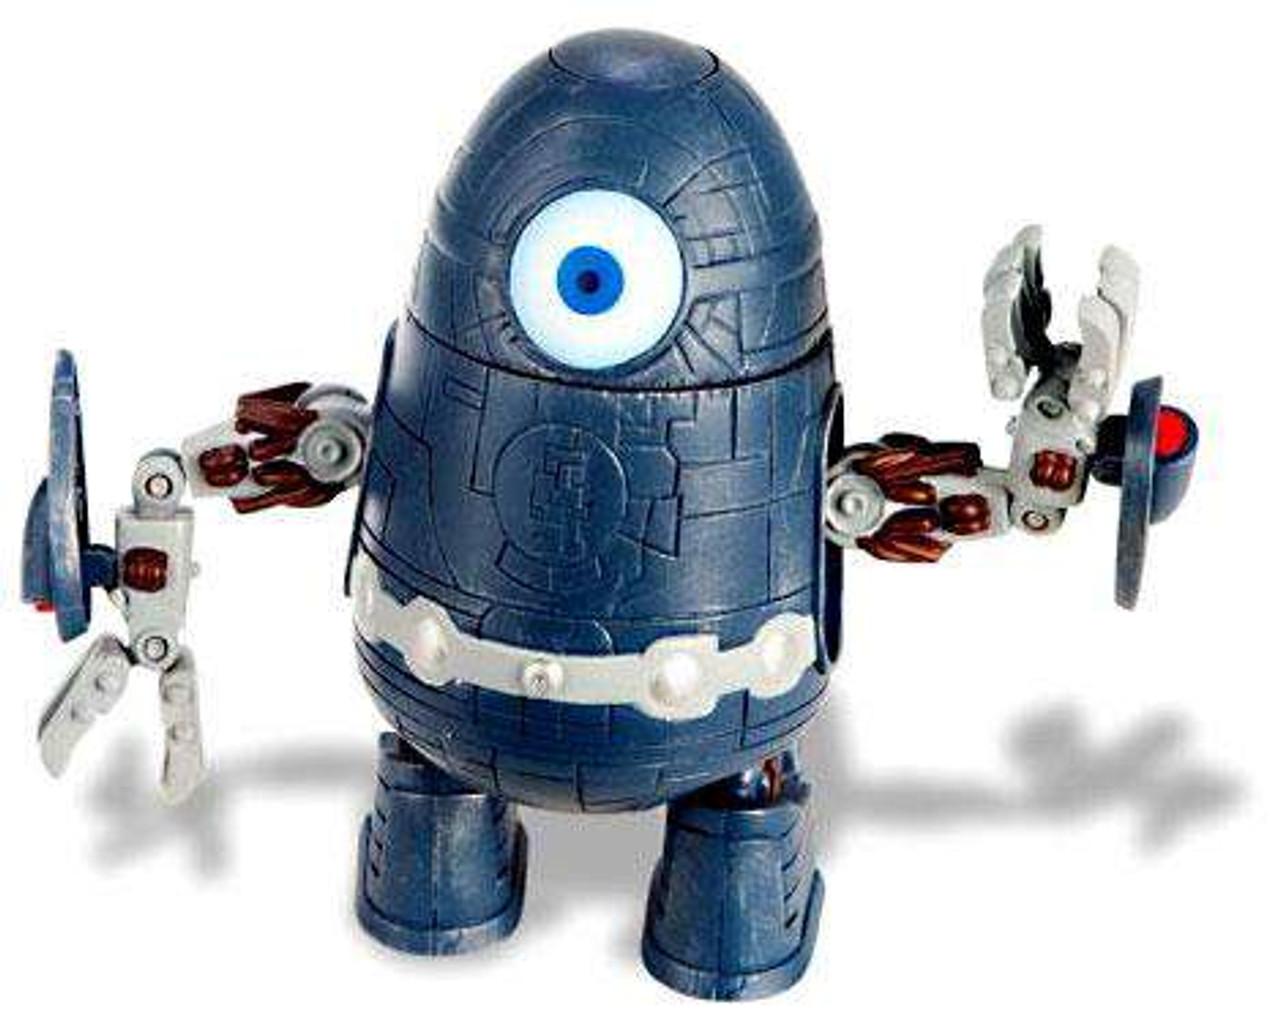 Monsters Vs Aliens Alien Clone Robot Action Figure Toywiz